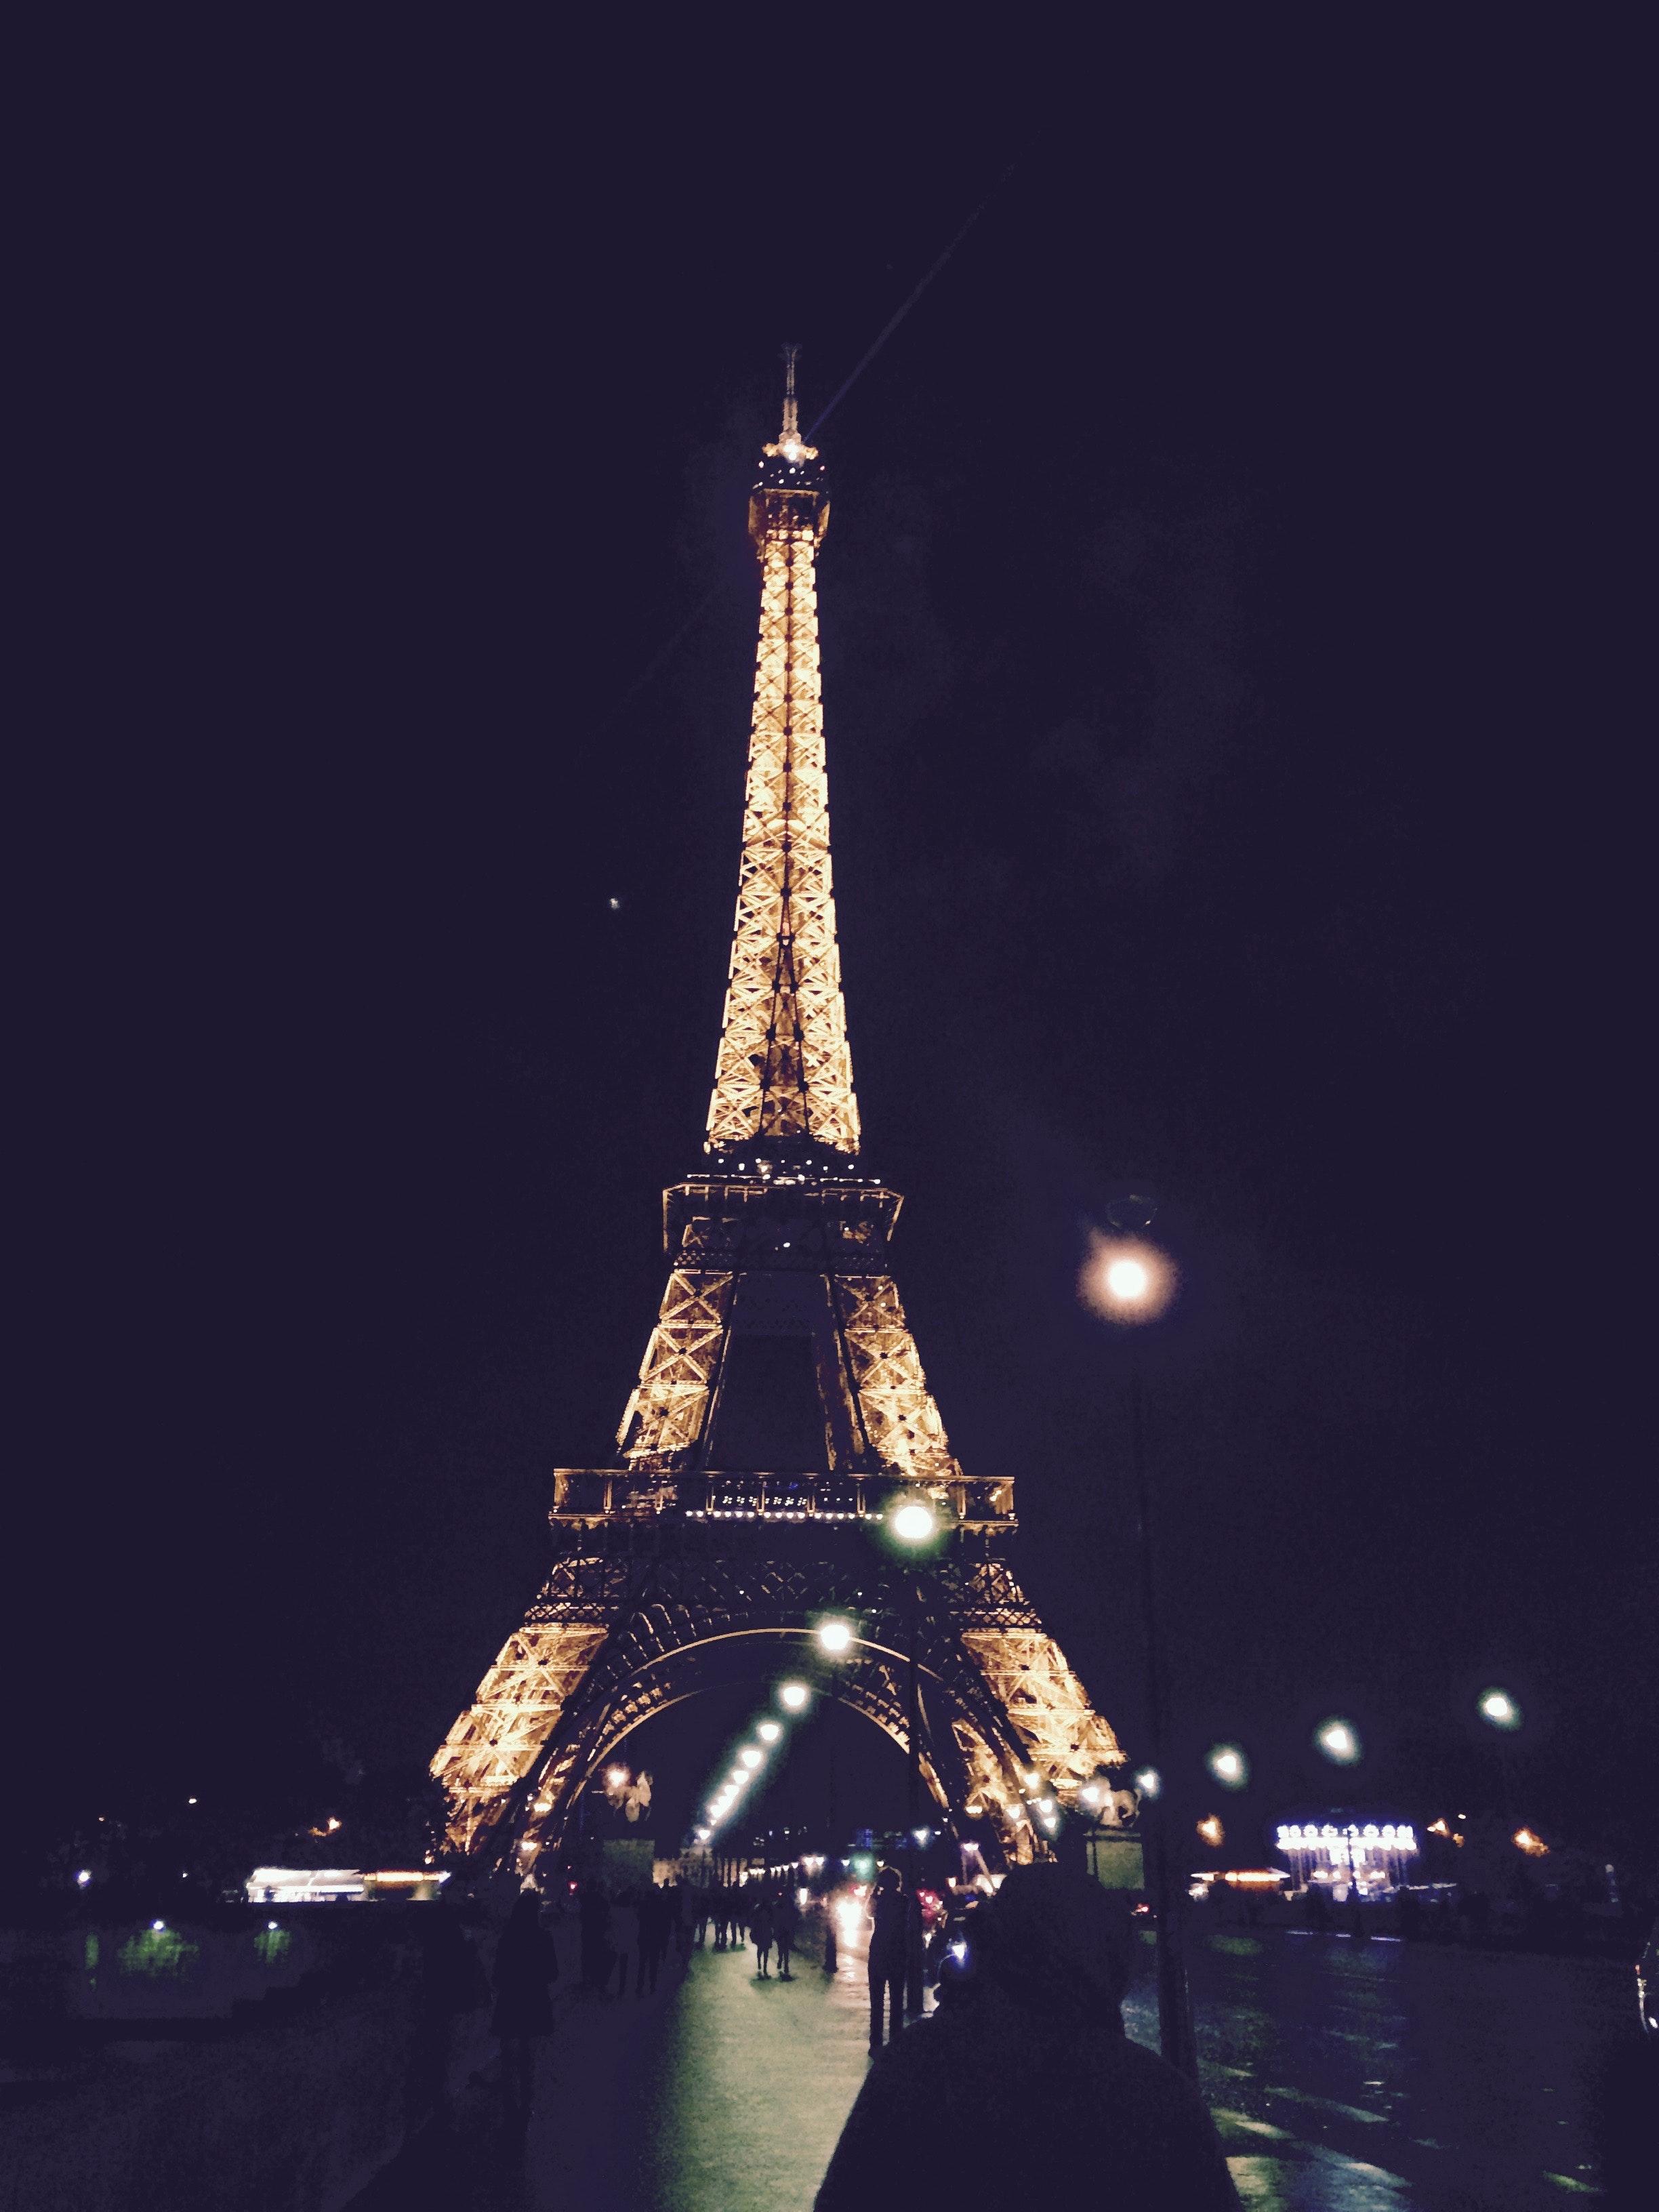 Eiffel Tower, Paris at Nighttime Sam Walker